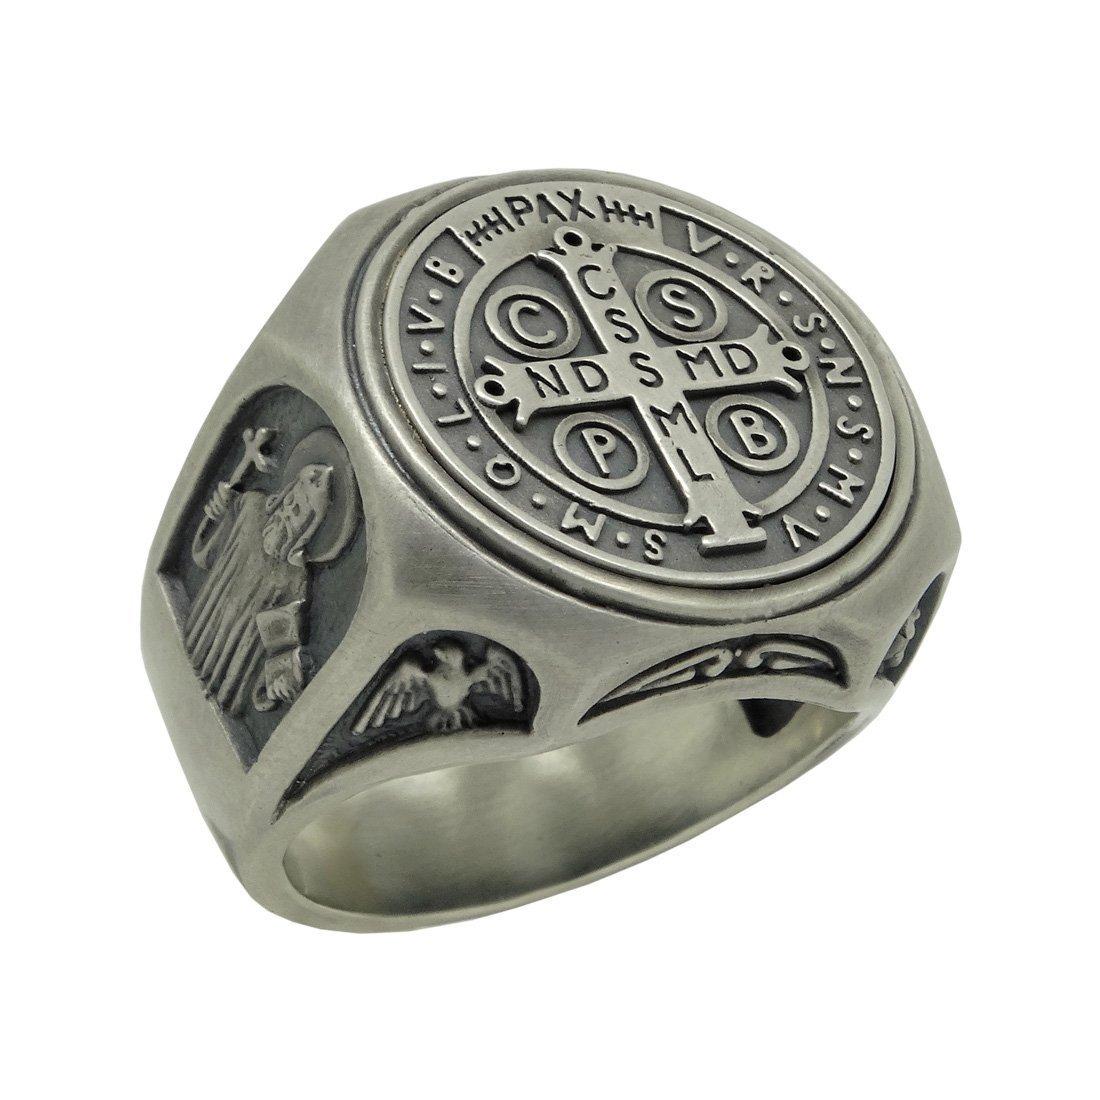 Saint Benedict Sterling Silver 925 Christian Roman Catholic Exorcism Mens Ring , Demon Protection